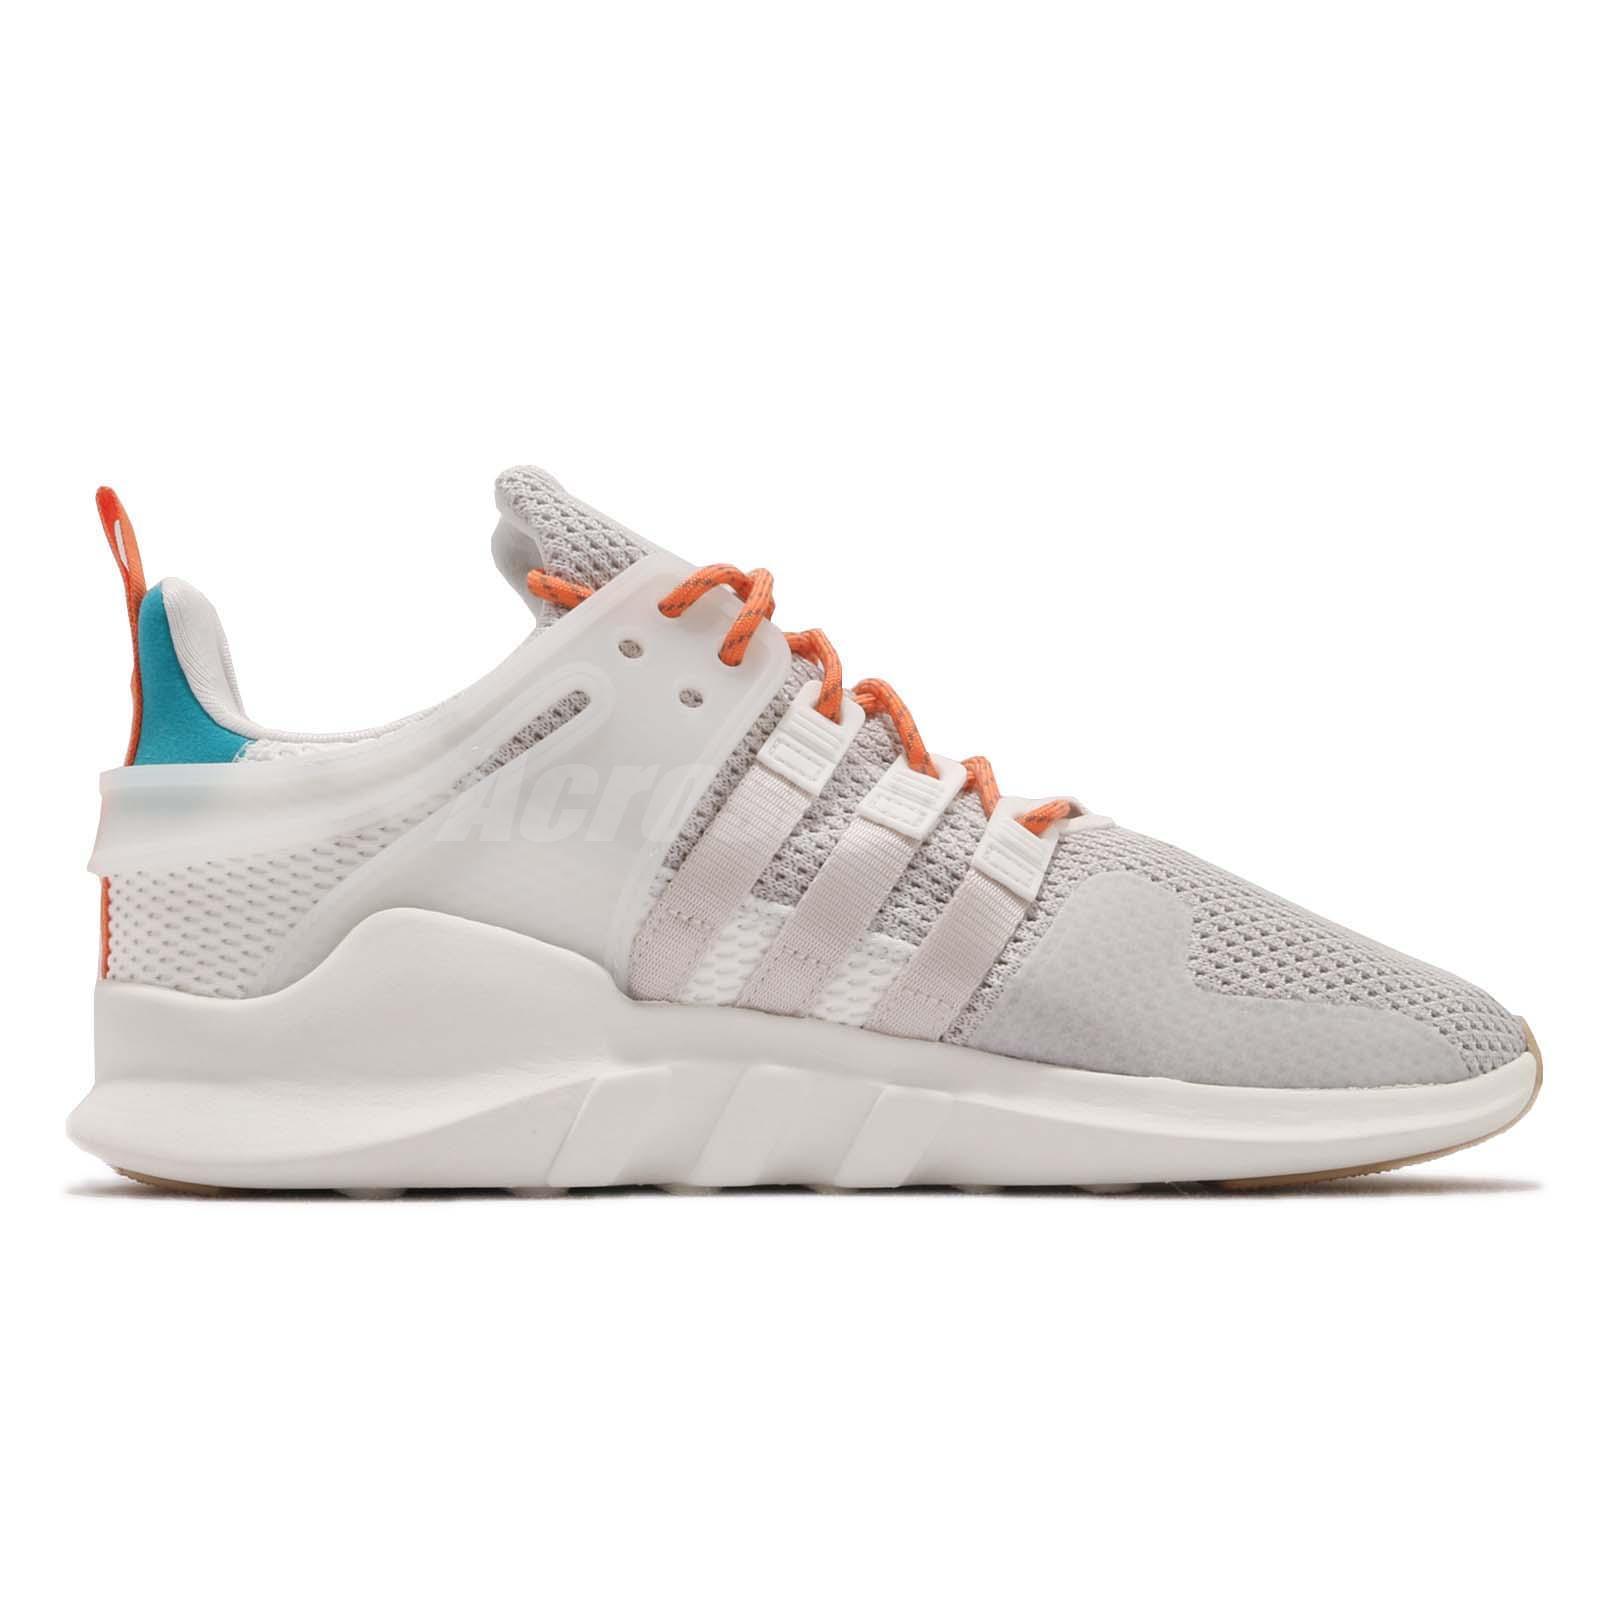 adidas Originals EQT Support ADV Summer White Tint Men Running Shoes ... ba6967c68